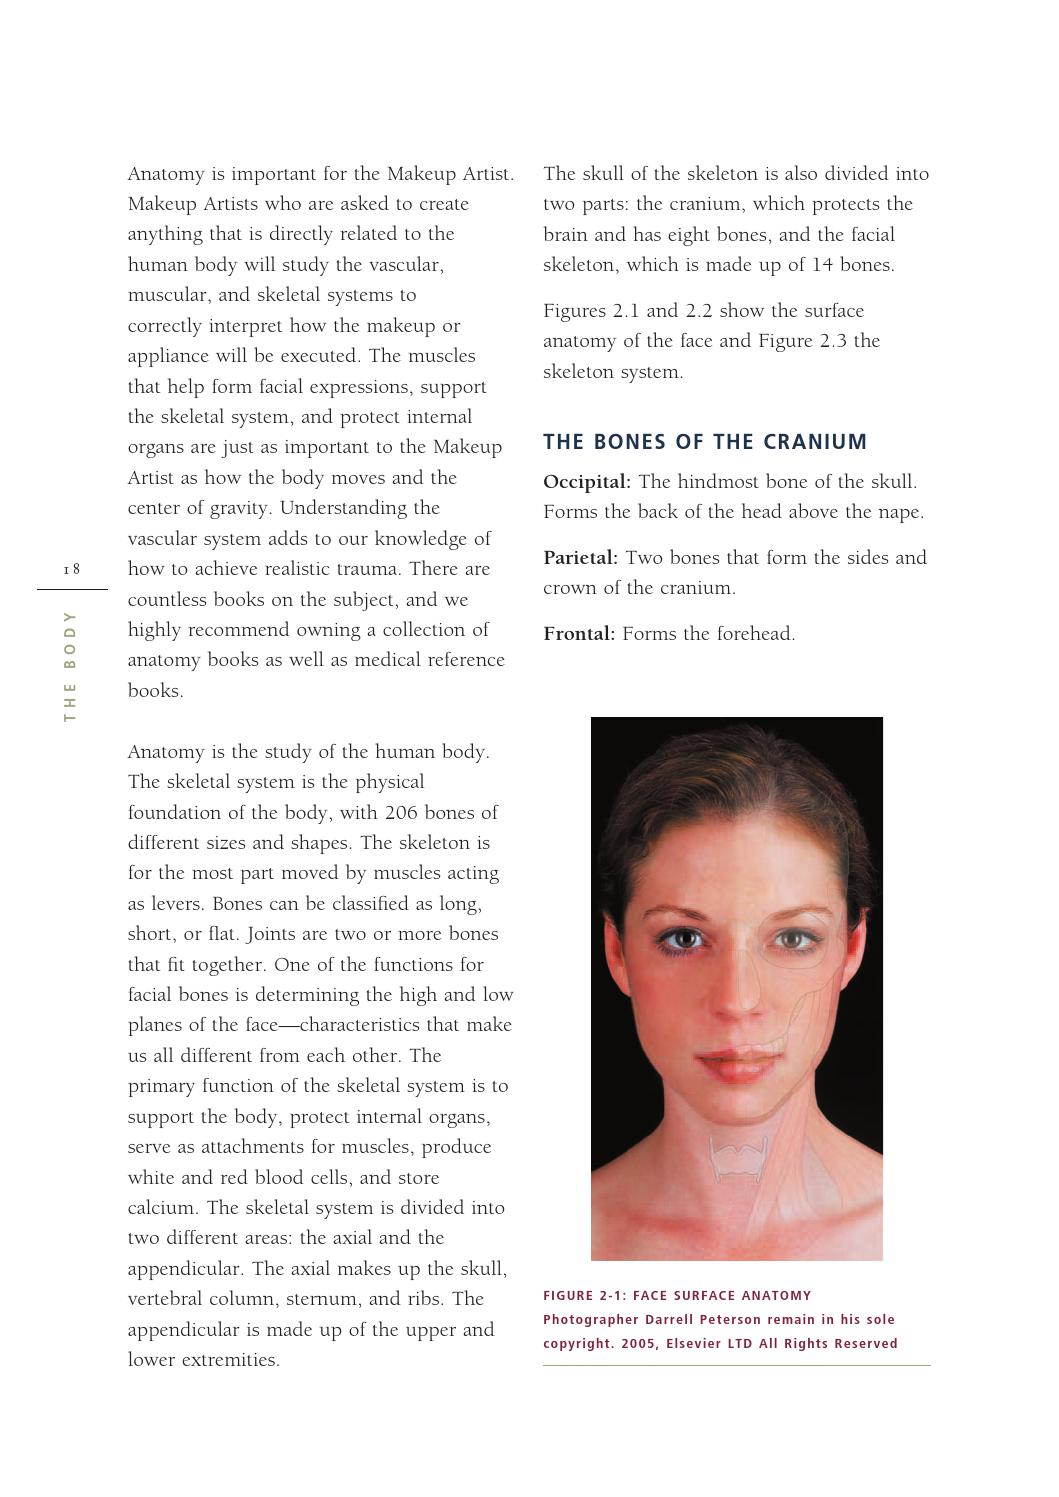 Make Up Artist Handbook By Pms1967 Issuu